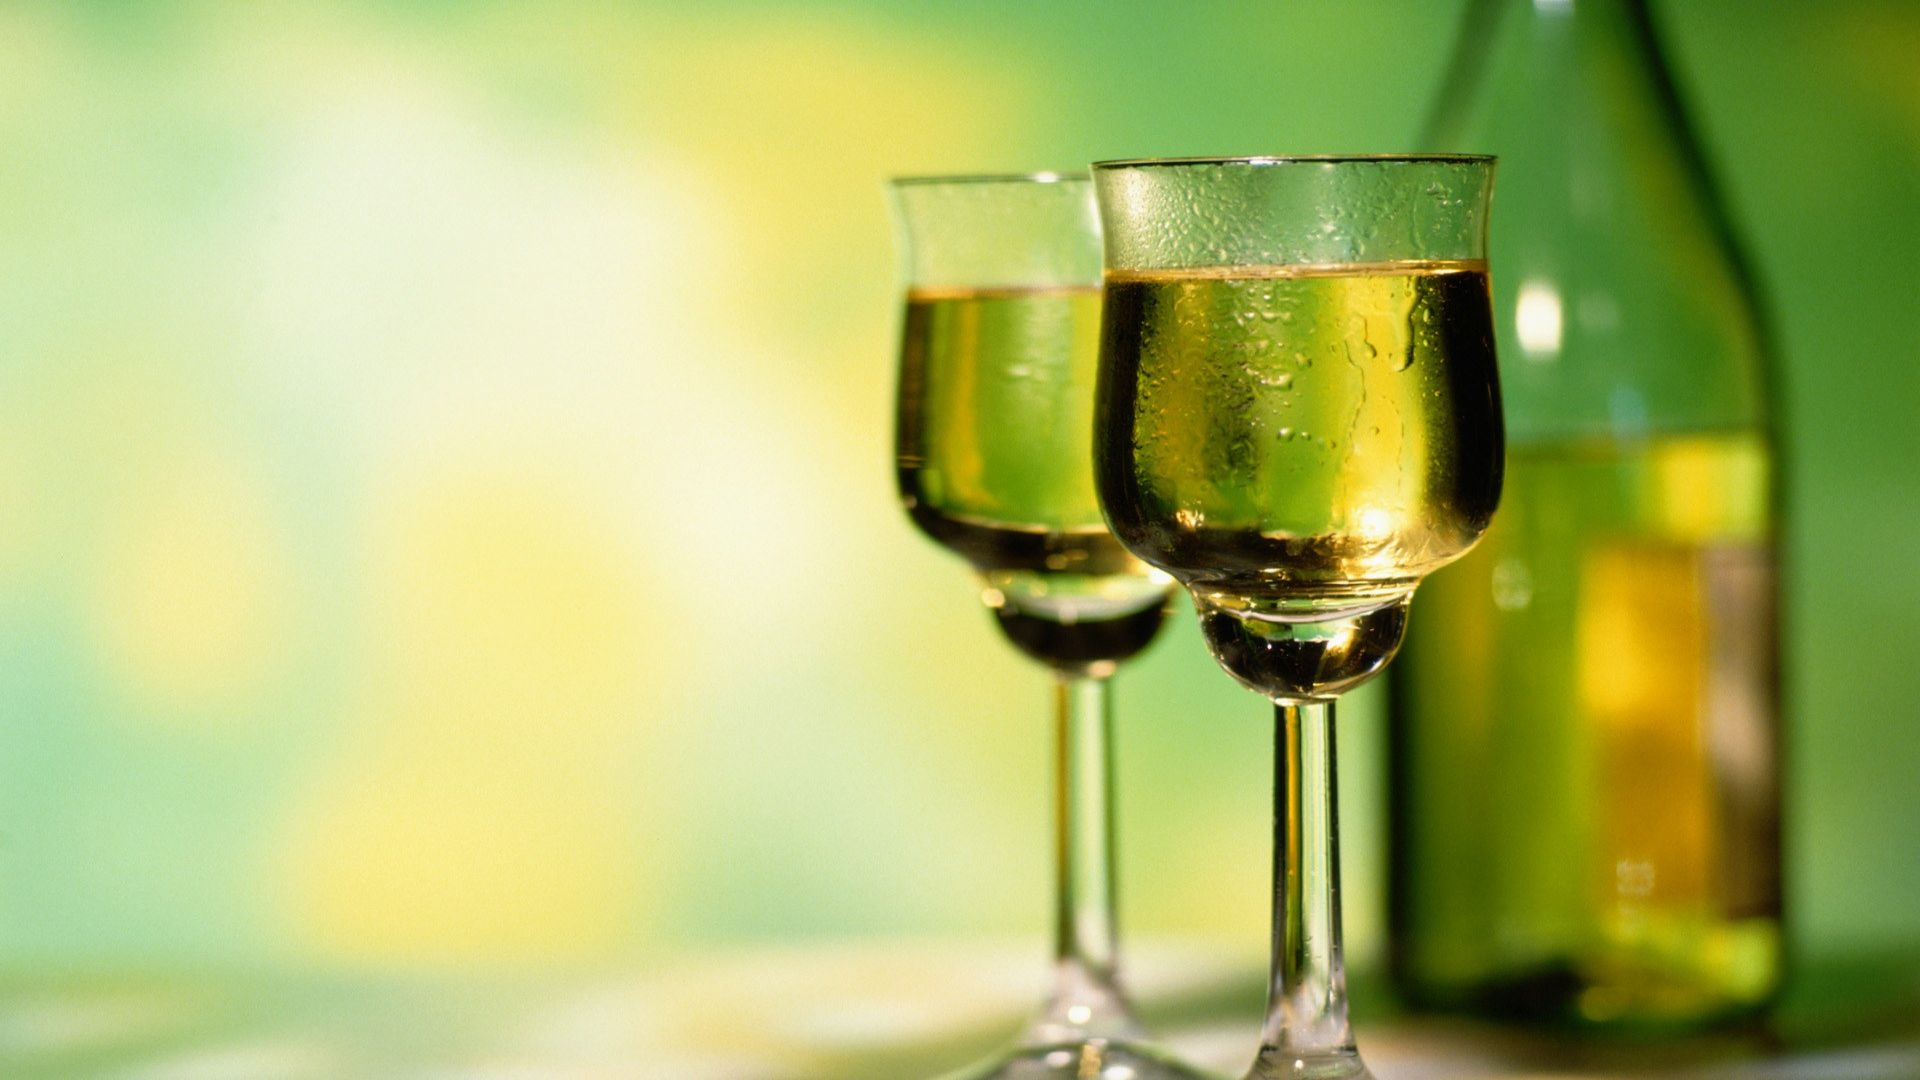 Wine Glass Wallpaper 6969924 1920x1080